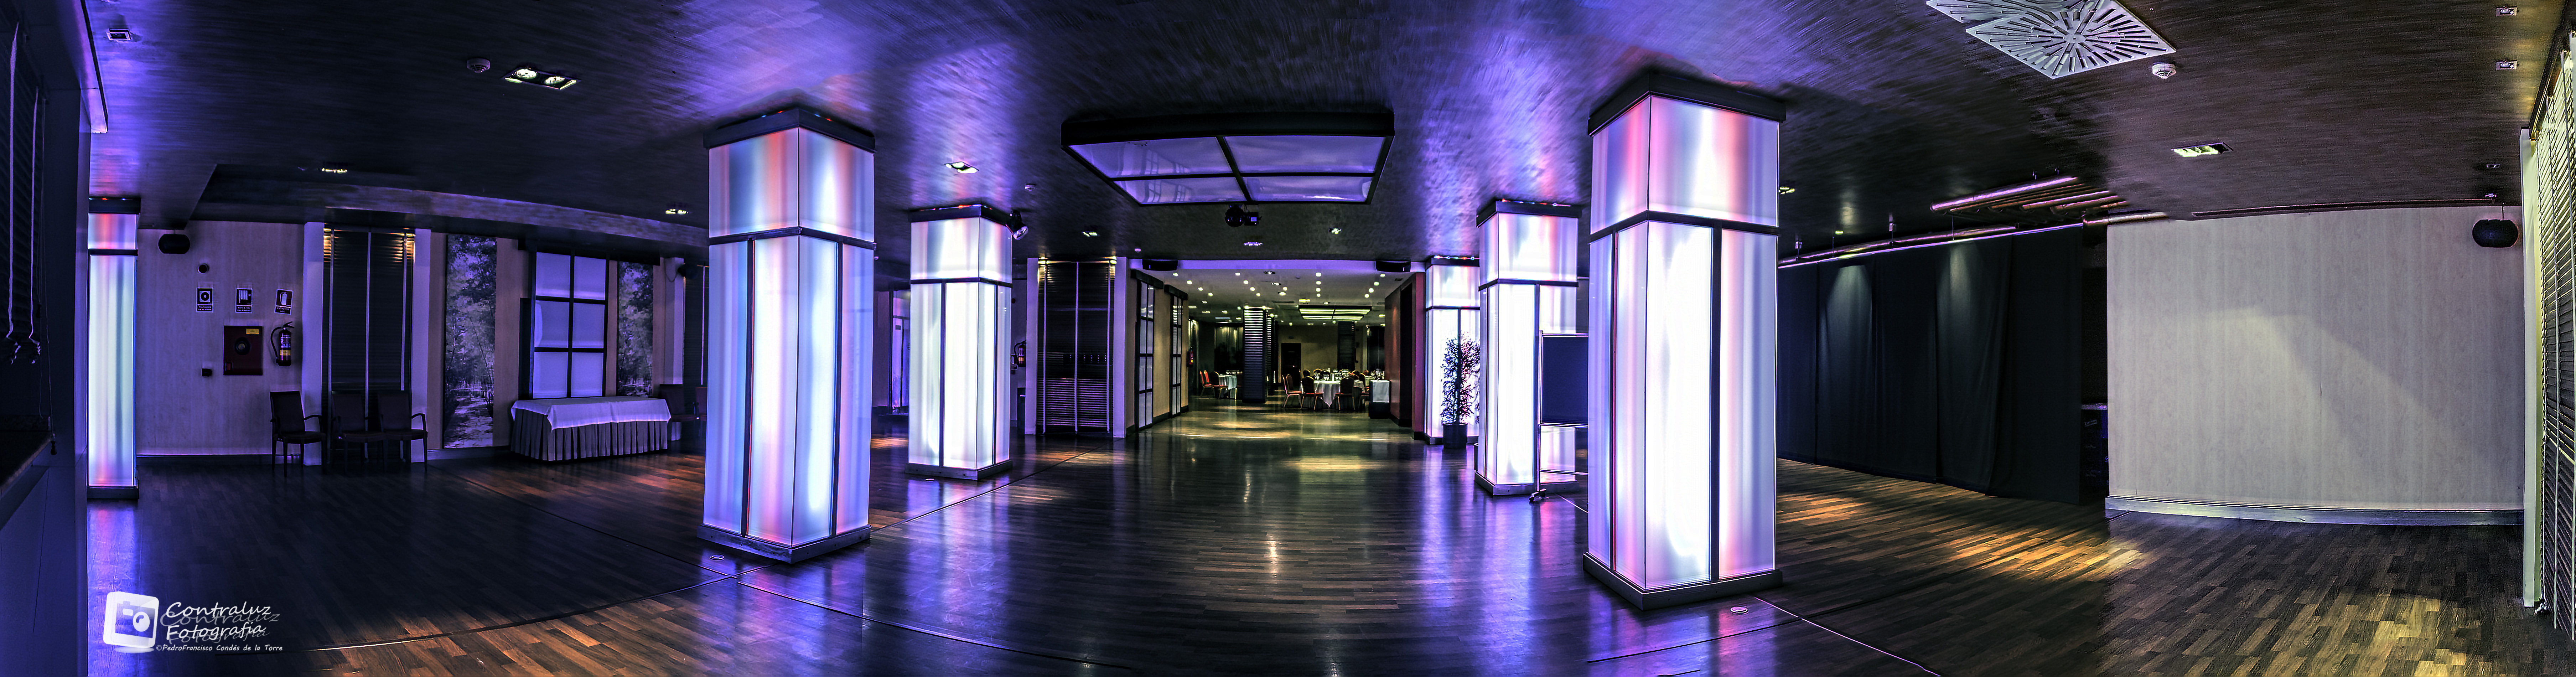 Foto Salón Imperial (discoteca)